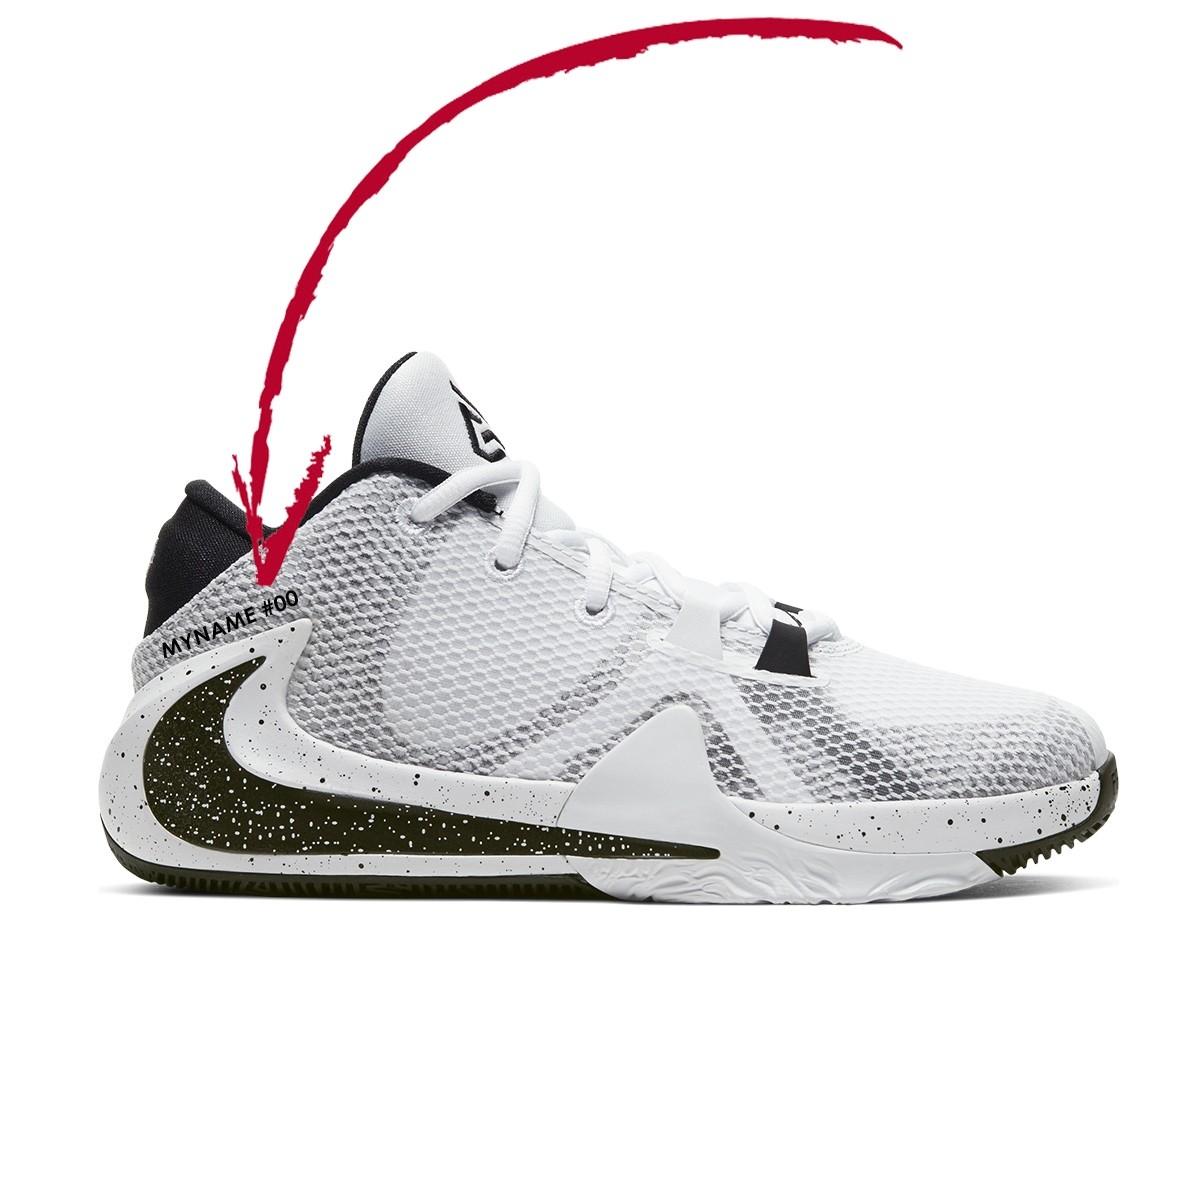 Nike Freak 1 GS 'Oreo'-BQ5633-101